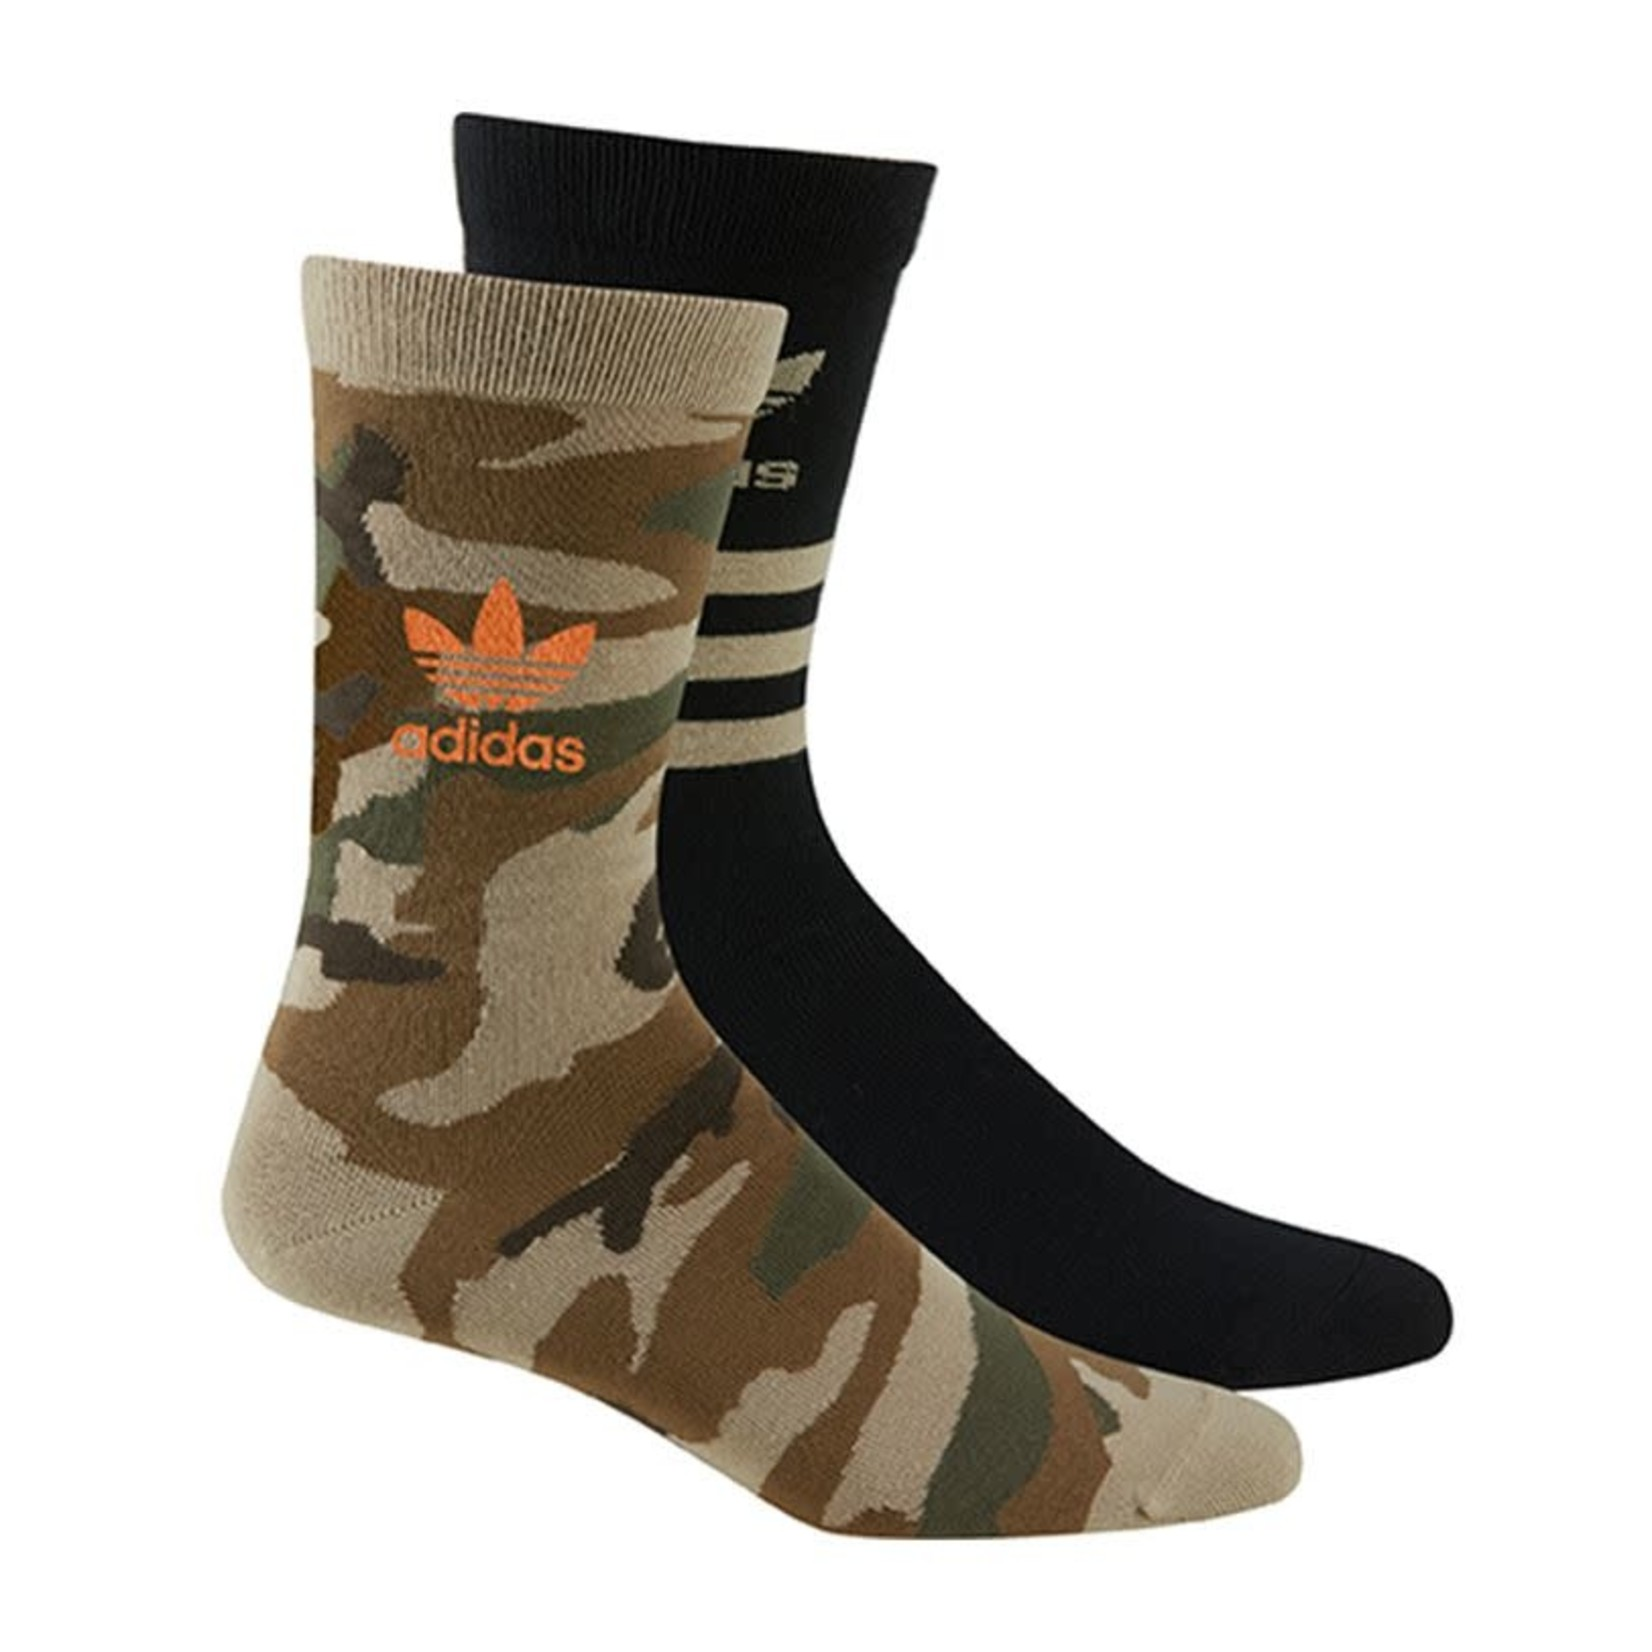 Adidas Adidas : 2Pack Crew Socks Hemp/Black O/S